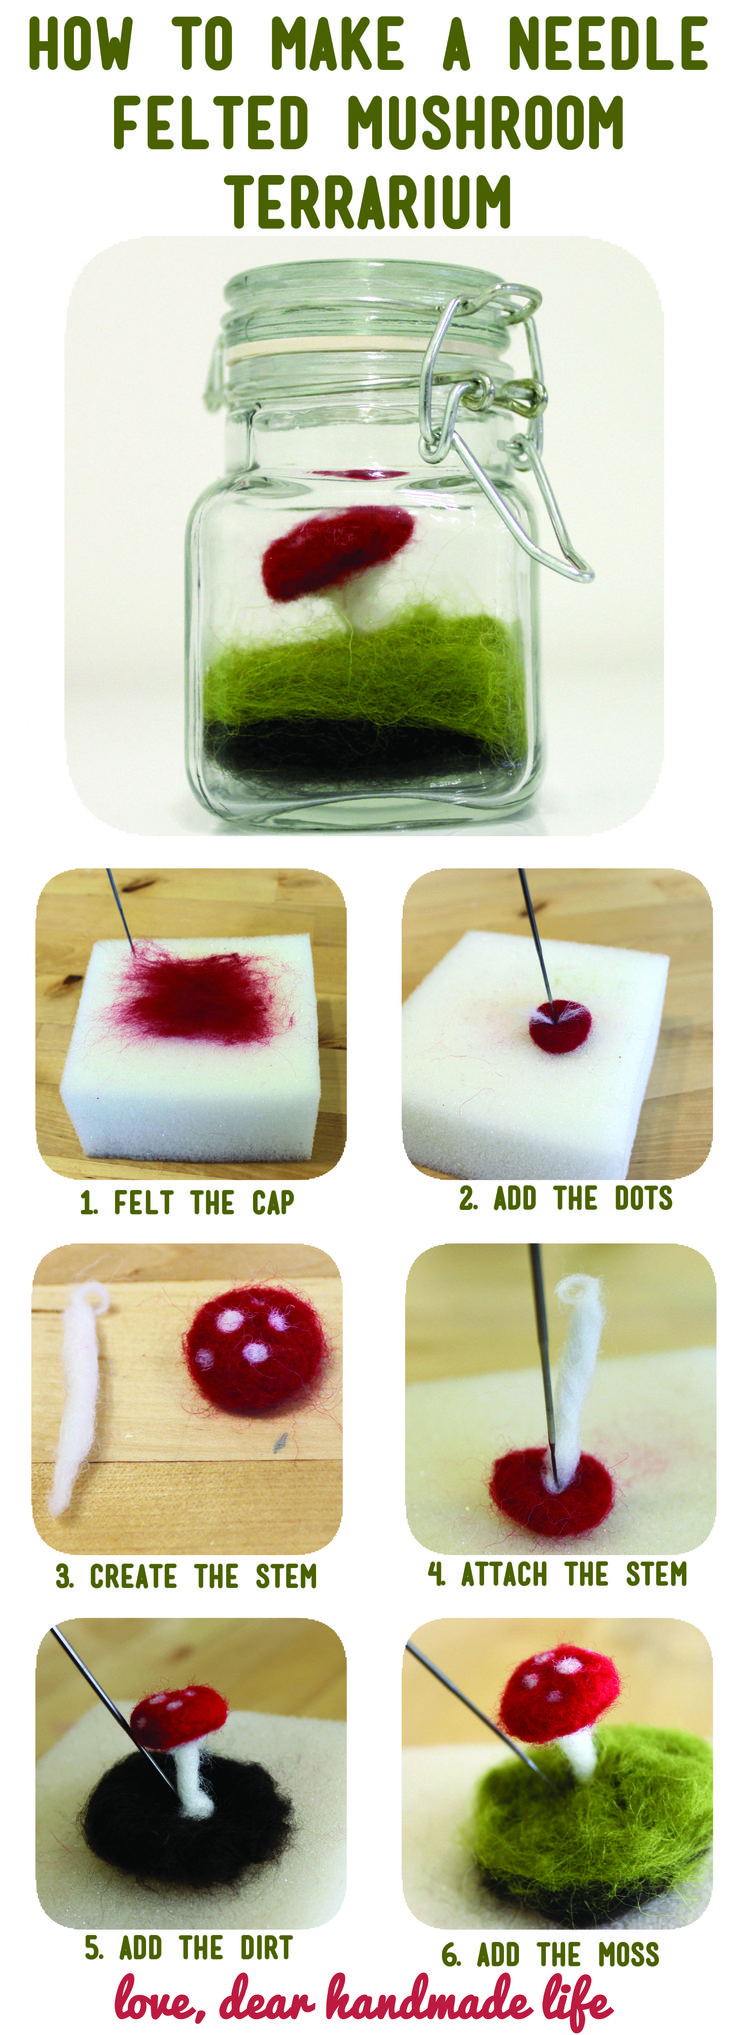 how-to-make-needle-felted-mushroom-terrarium-dear-handmade-life-craft-tutorial-diy